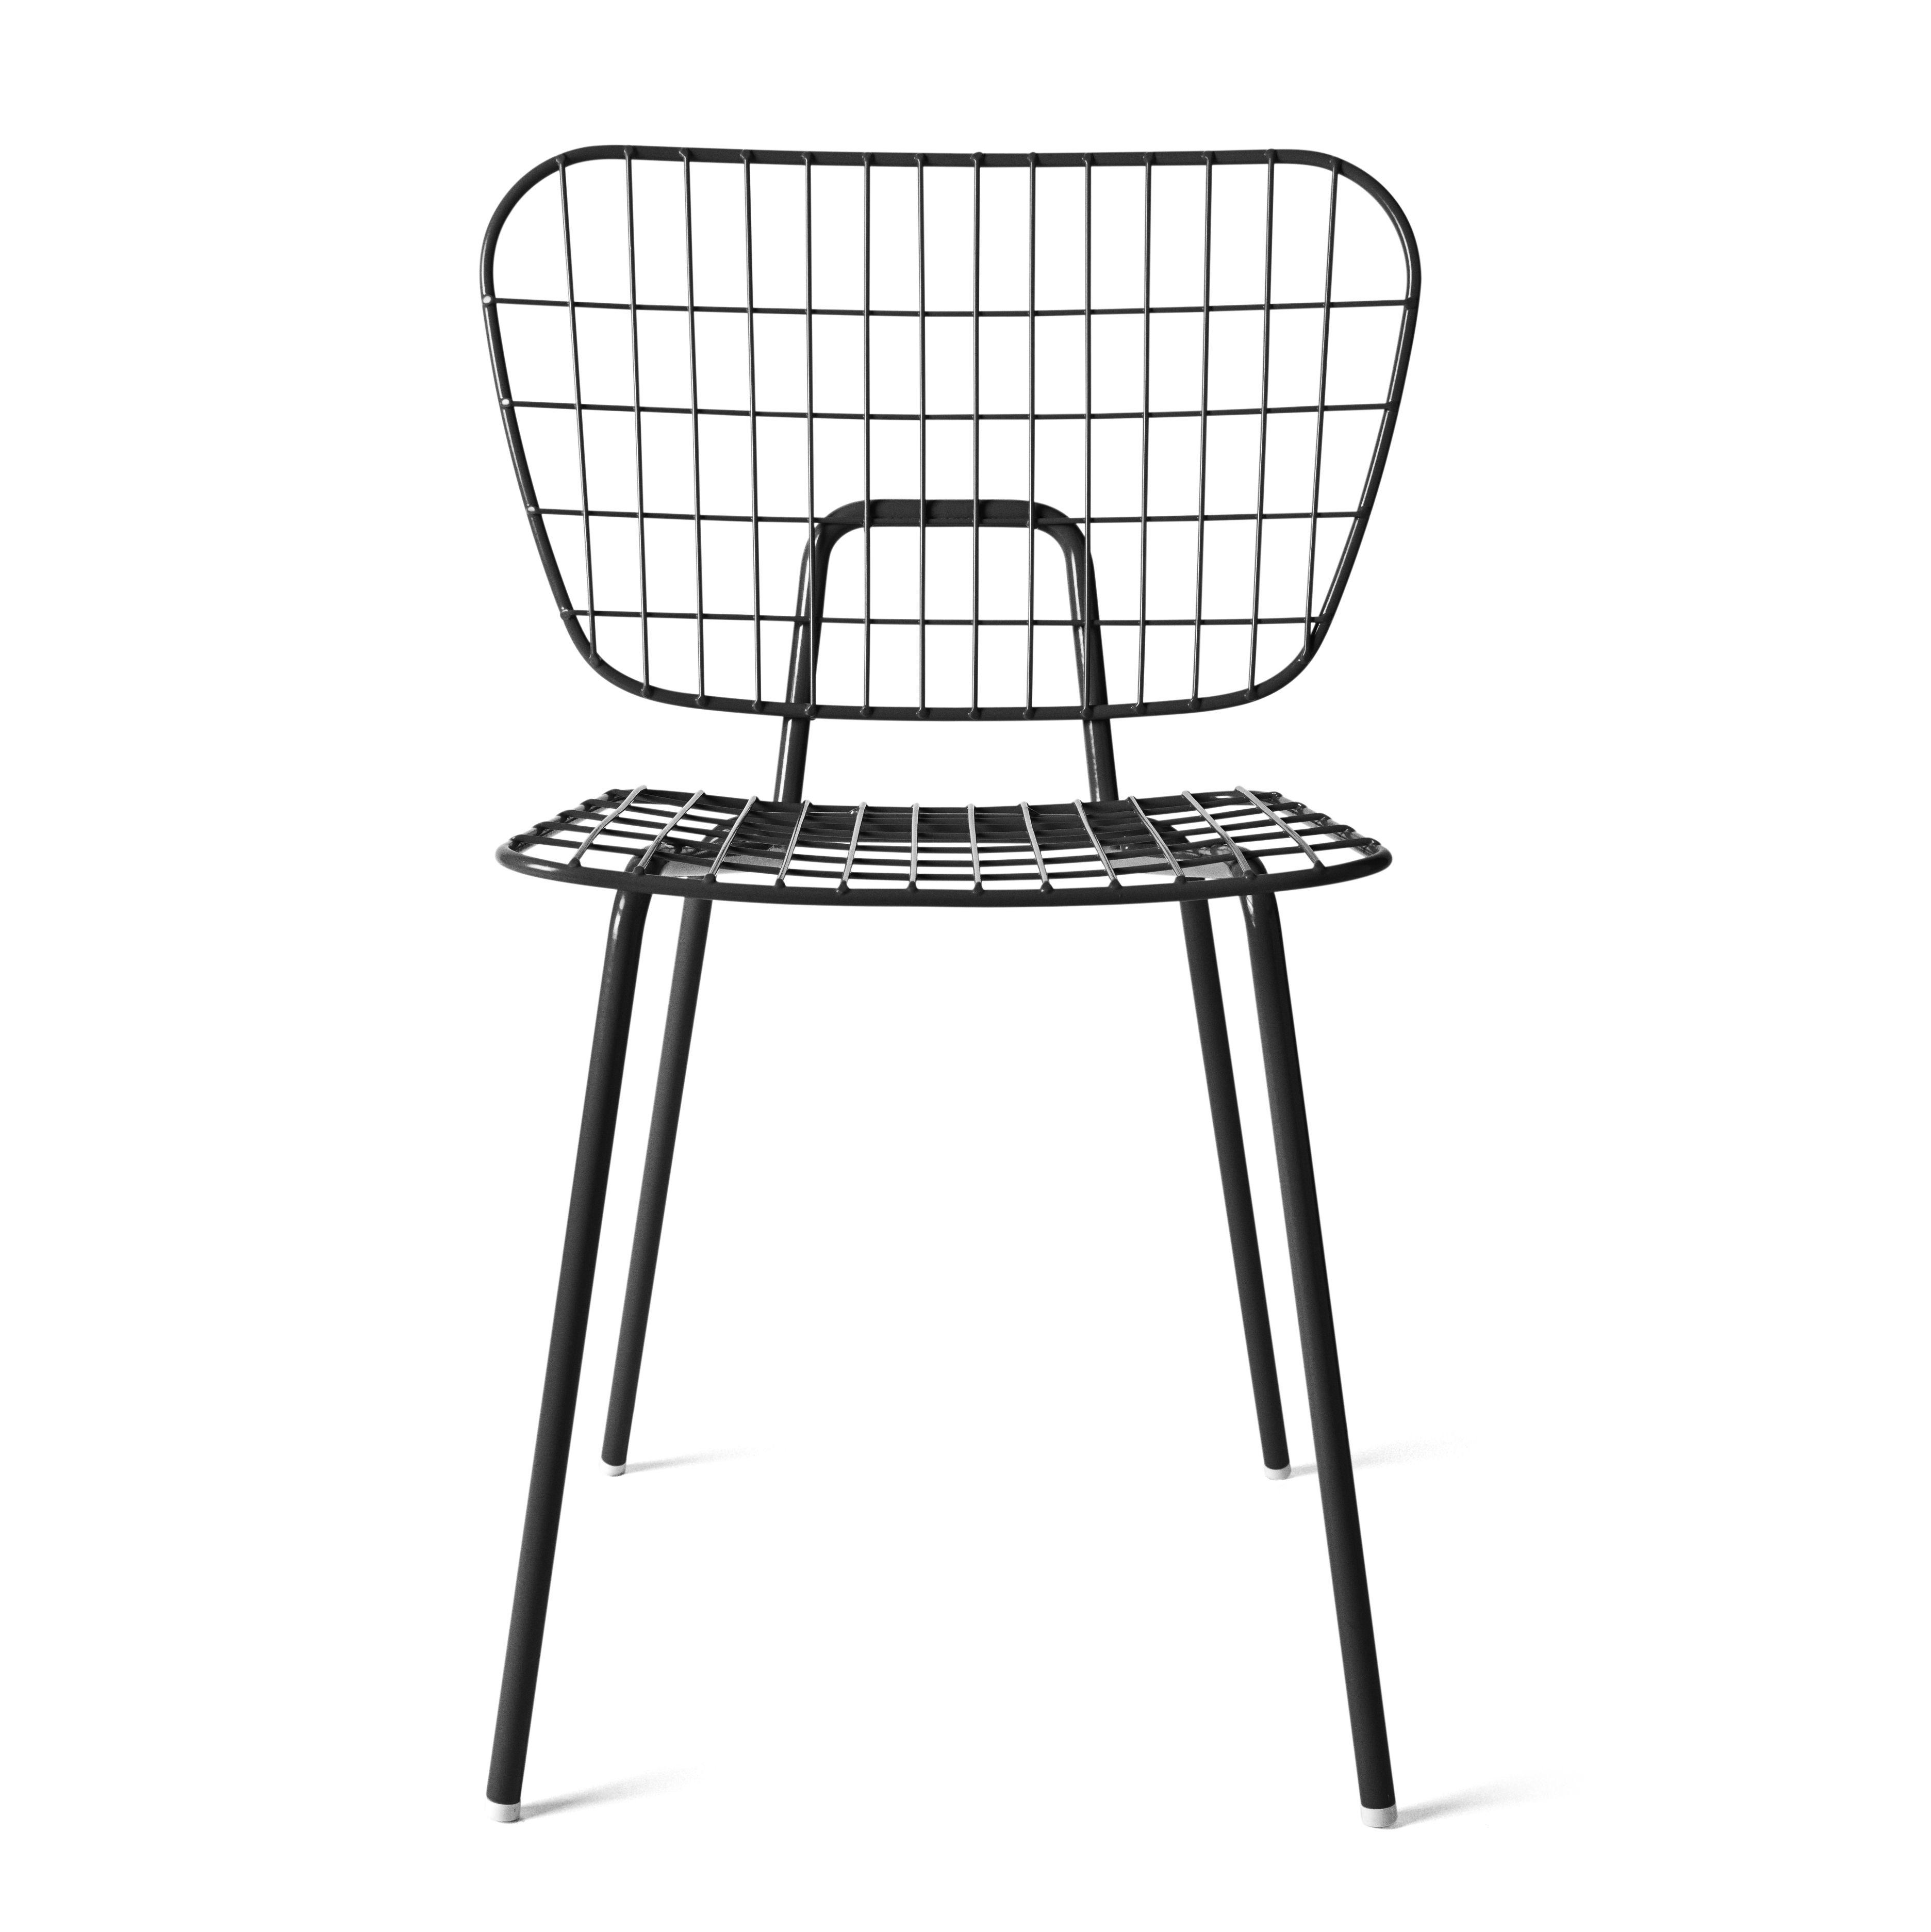 steel chair price in bangladesh high belt replacement wm string black by menu